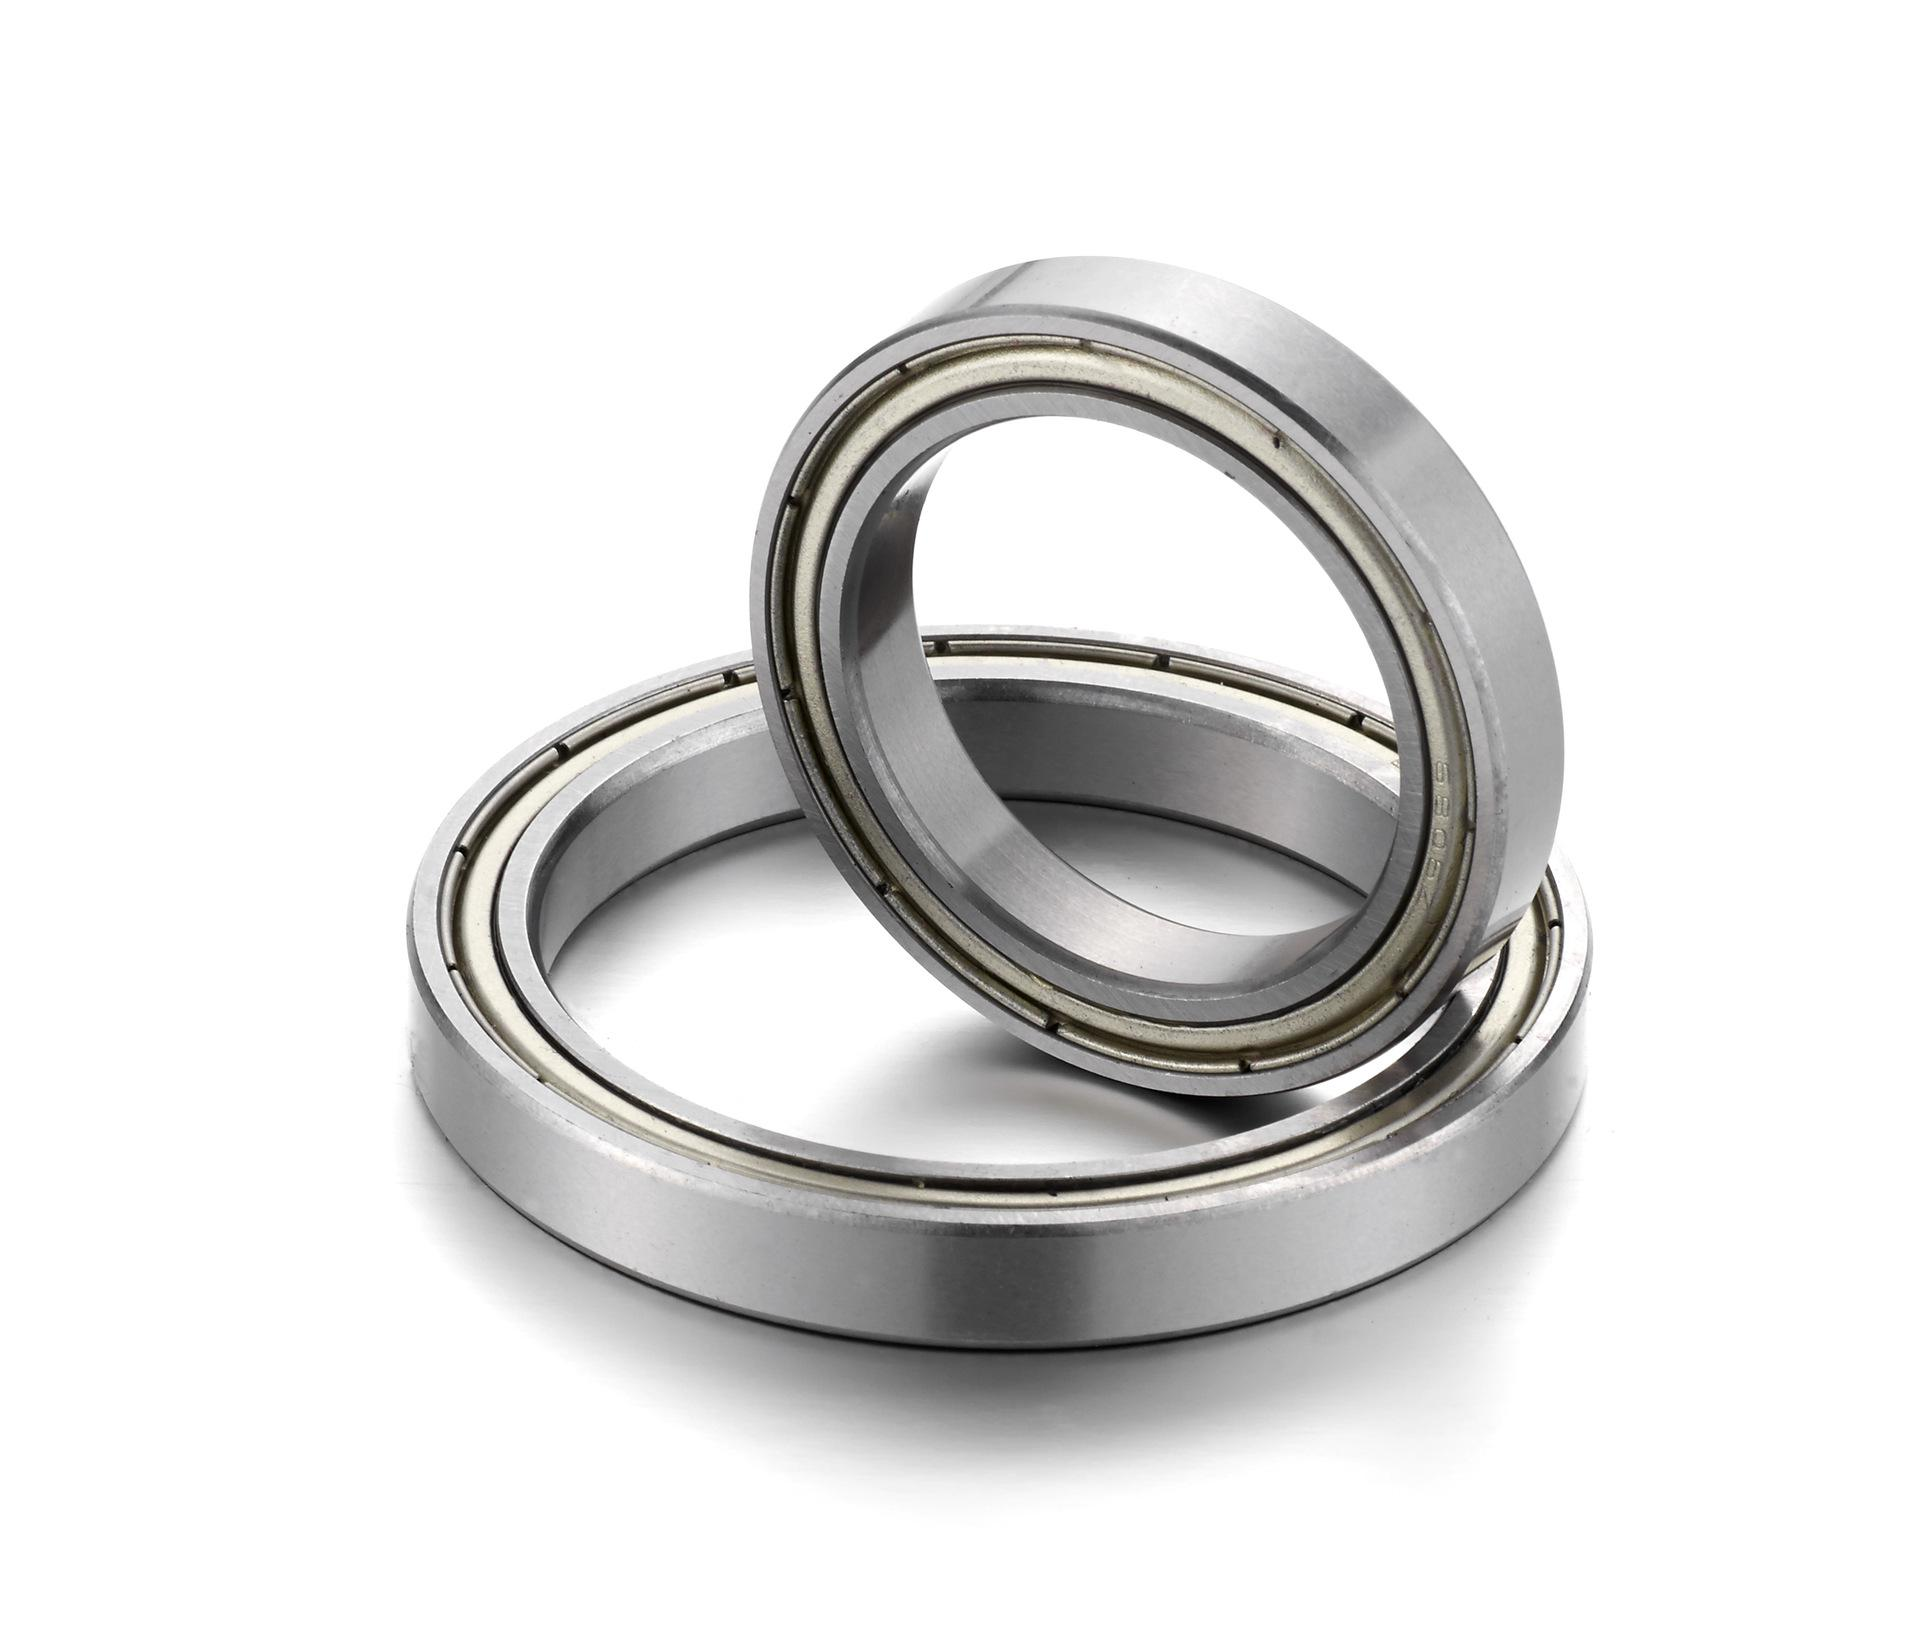 6830M ABEC-1 150x190x20mm Metric Thin Section Bearings 61830M Brass cage 6830 2rs 150x190x20mm metric thin section bearings 61830 rs